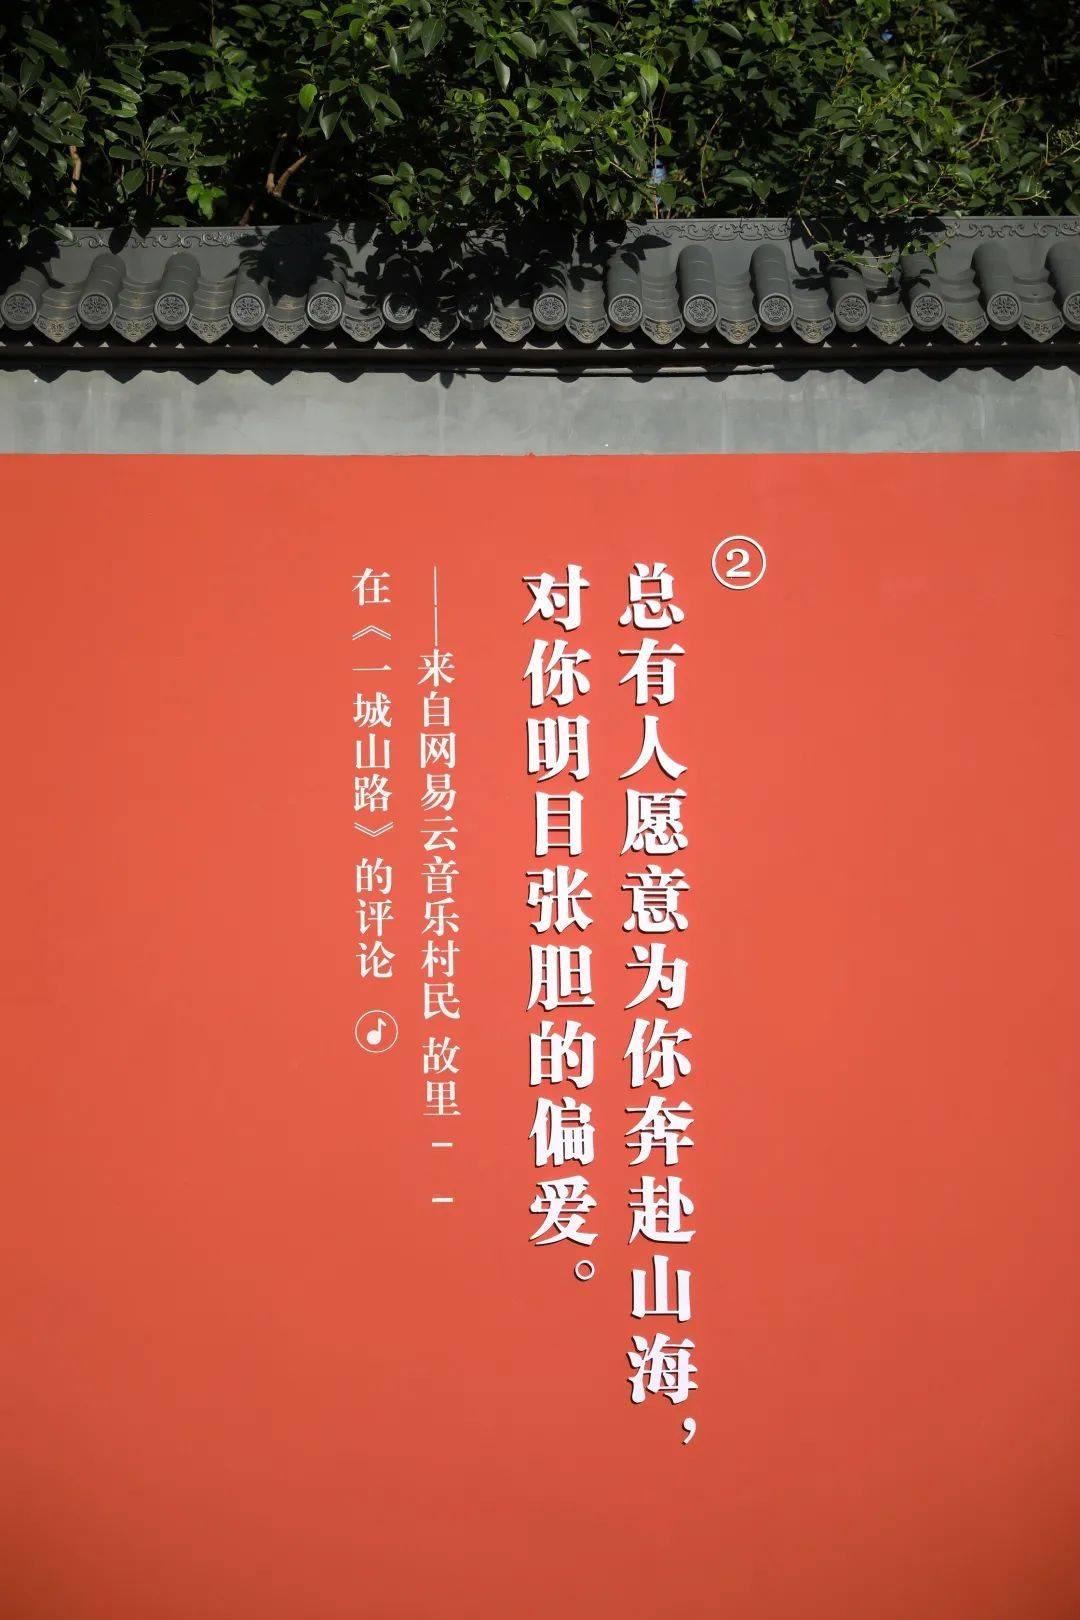 9101000976141aaa068d956.59791695 - 网易云音乐,一本情感营销的教科书